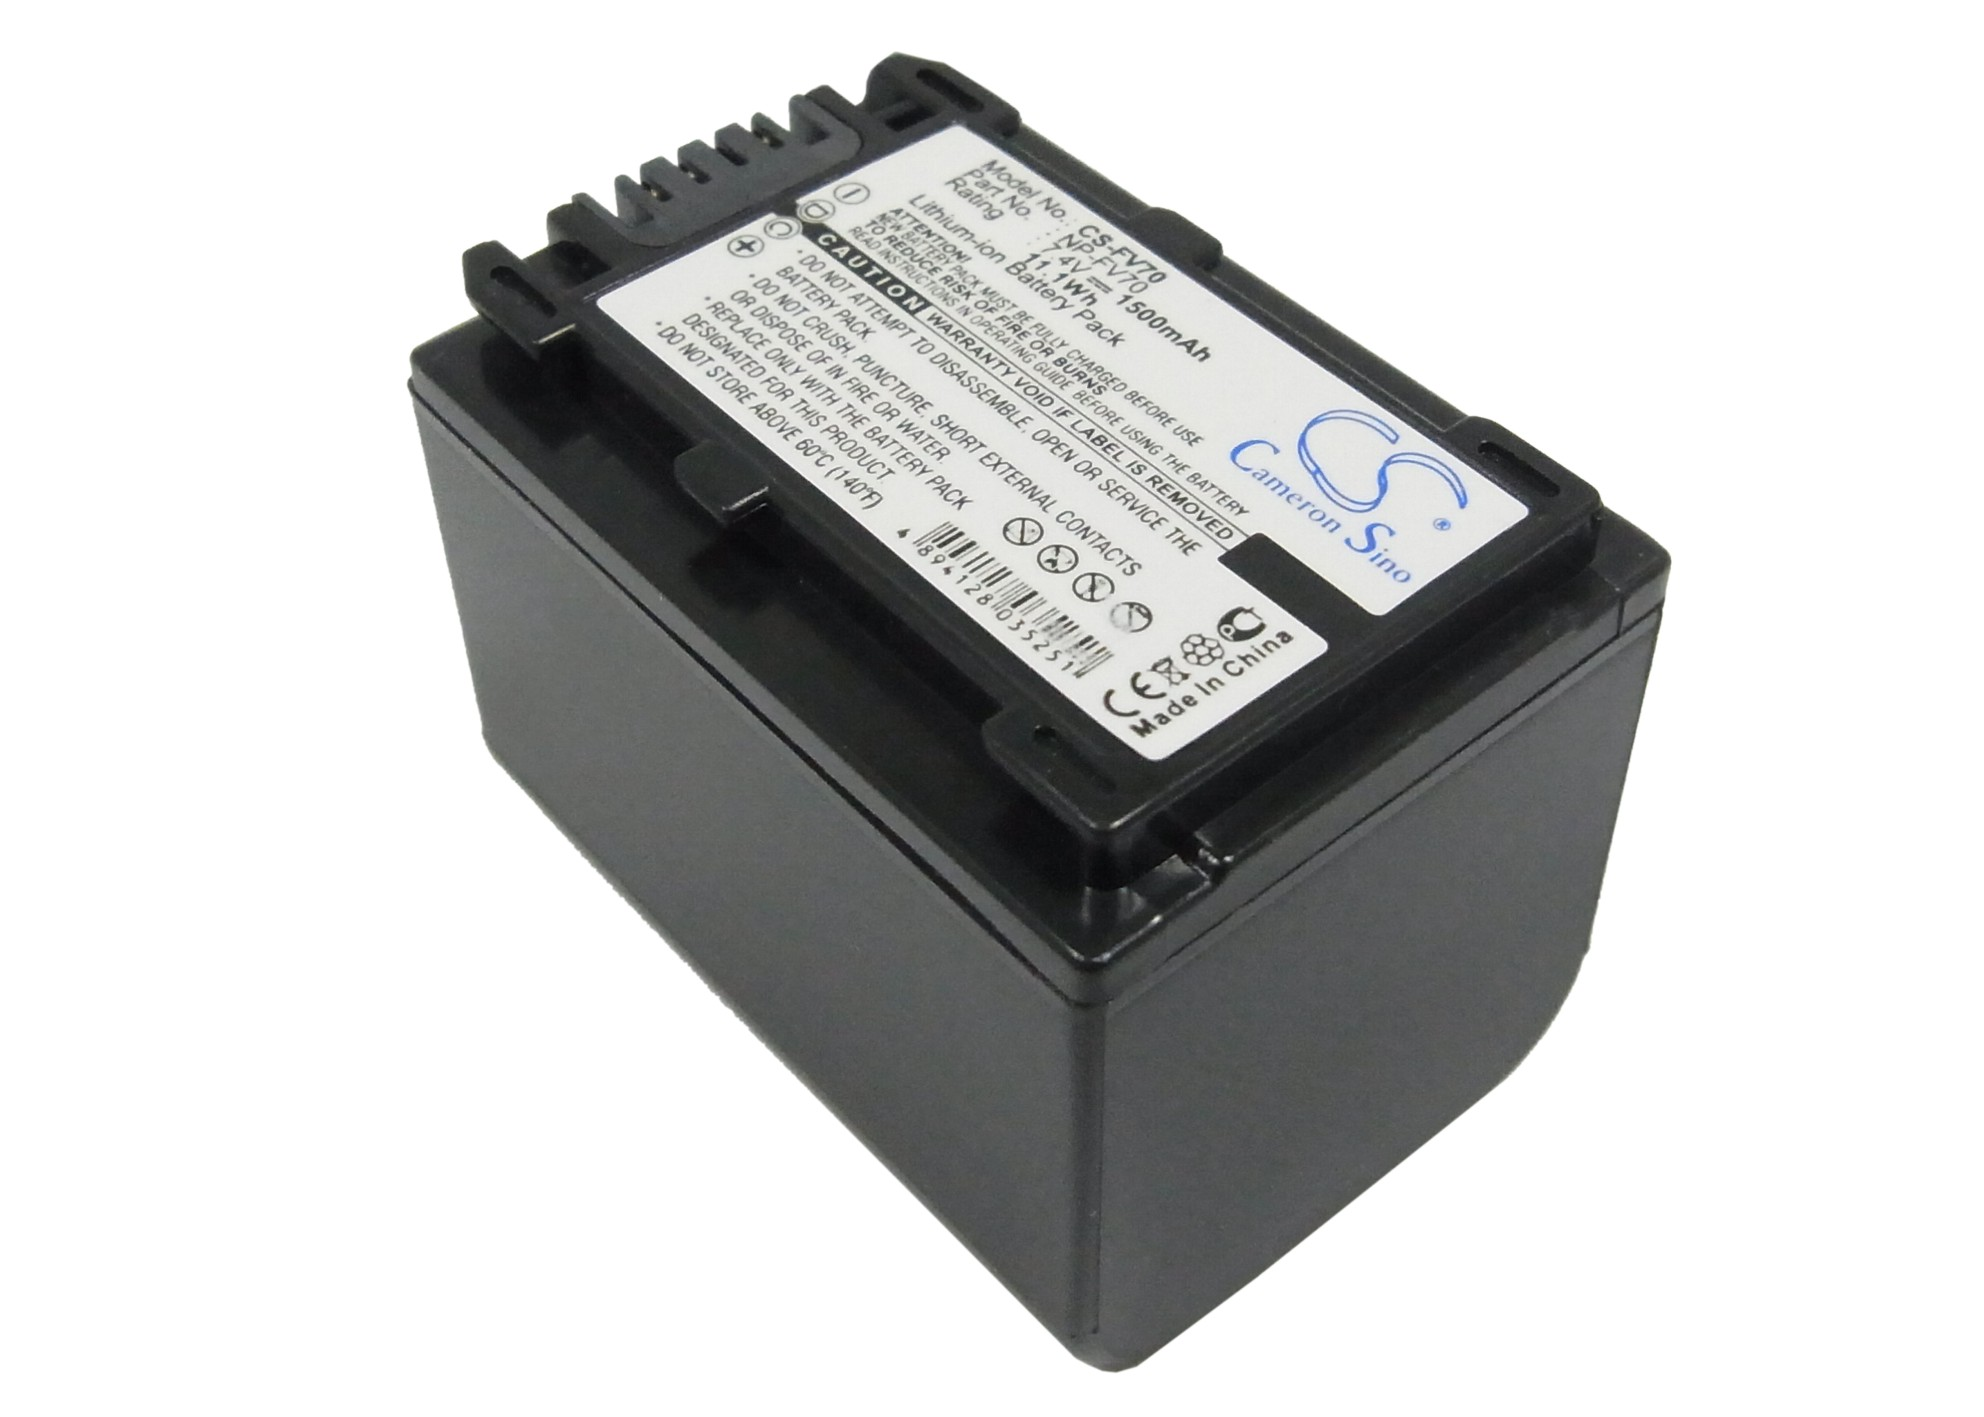 Cameron Sino baterie do kamer a fotoaparátů pro SONY DCR-SX45E 7.4V Li-ion 1500mAh černá - neoriginální